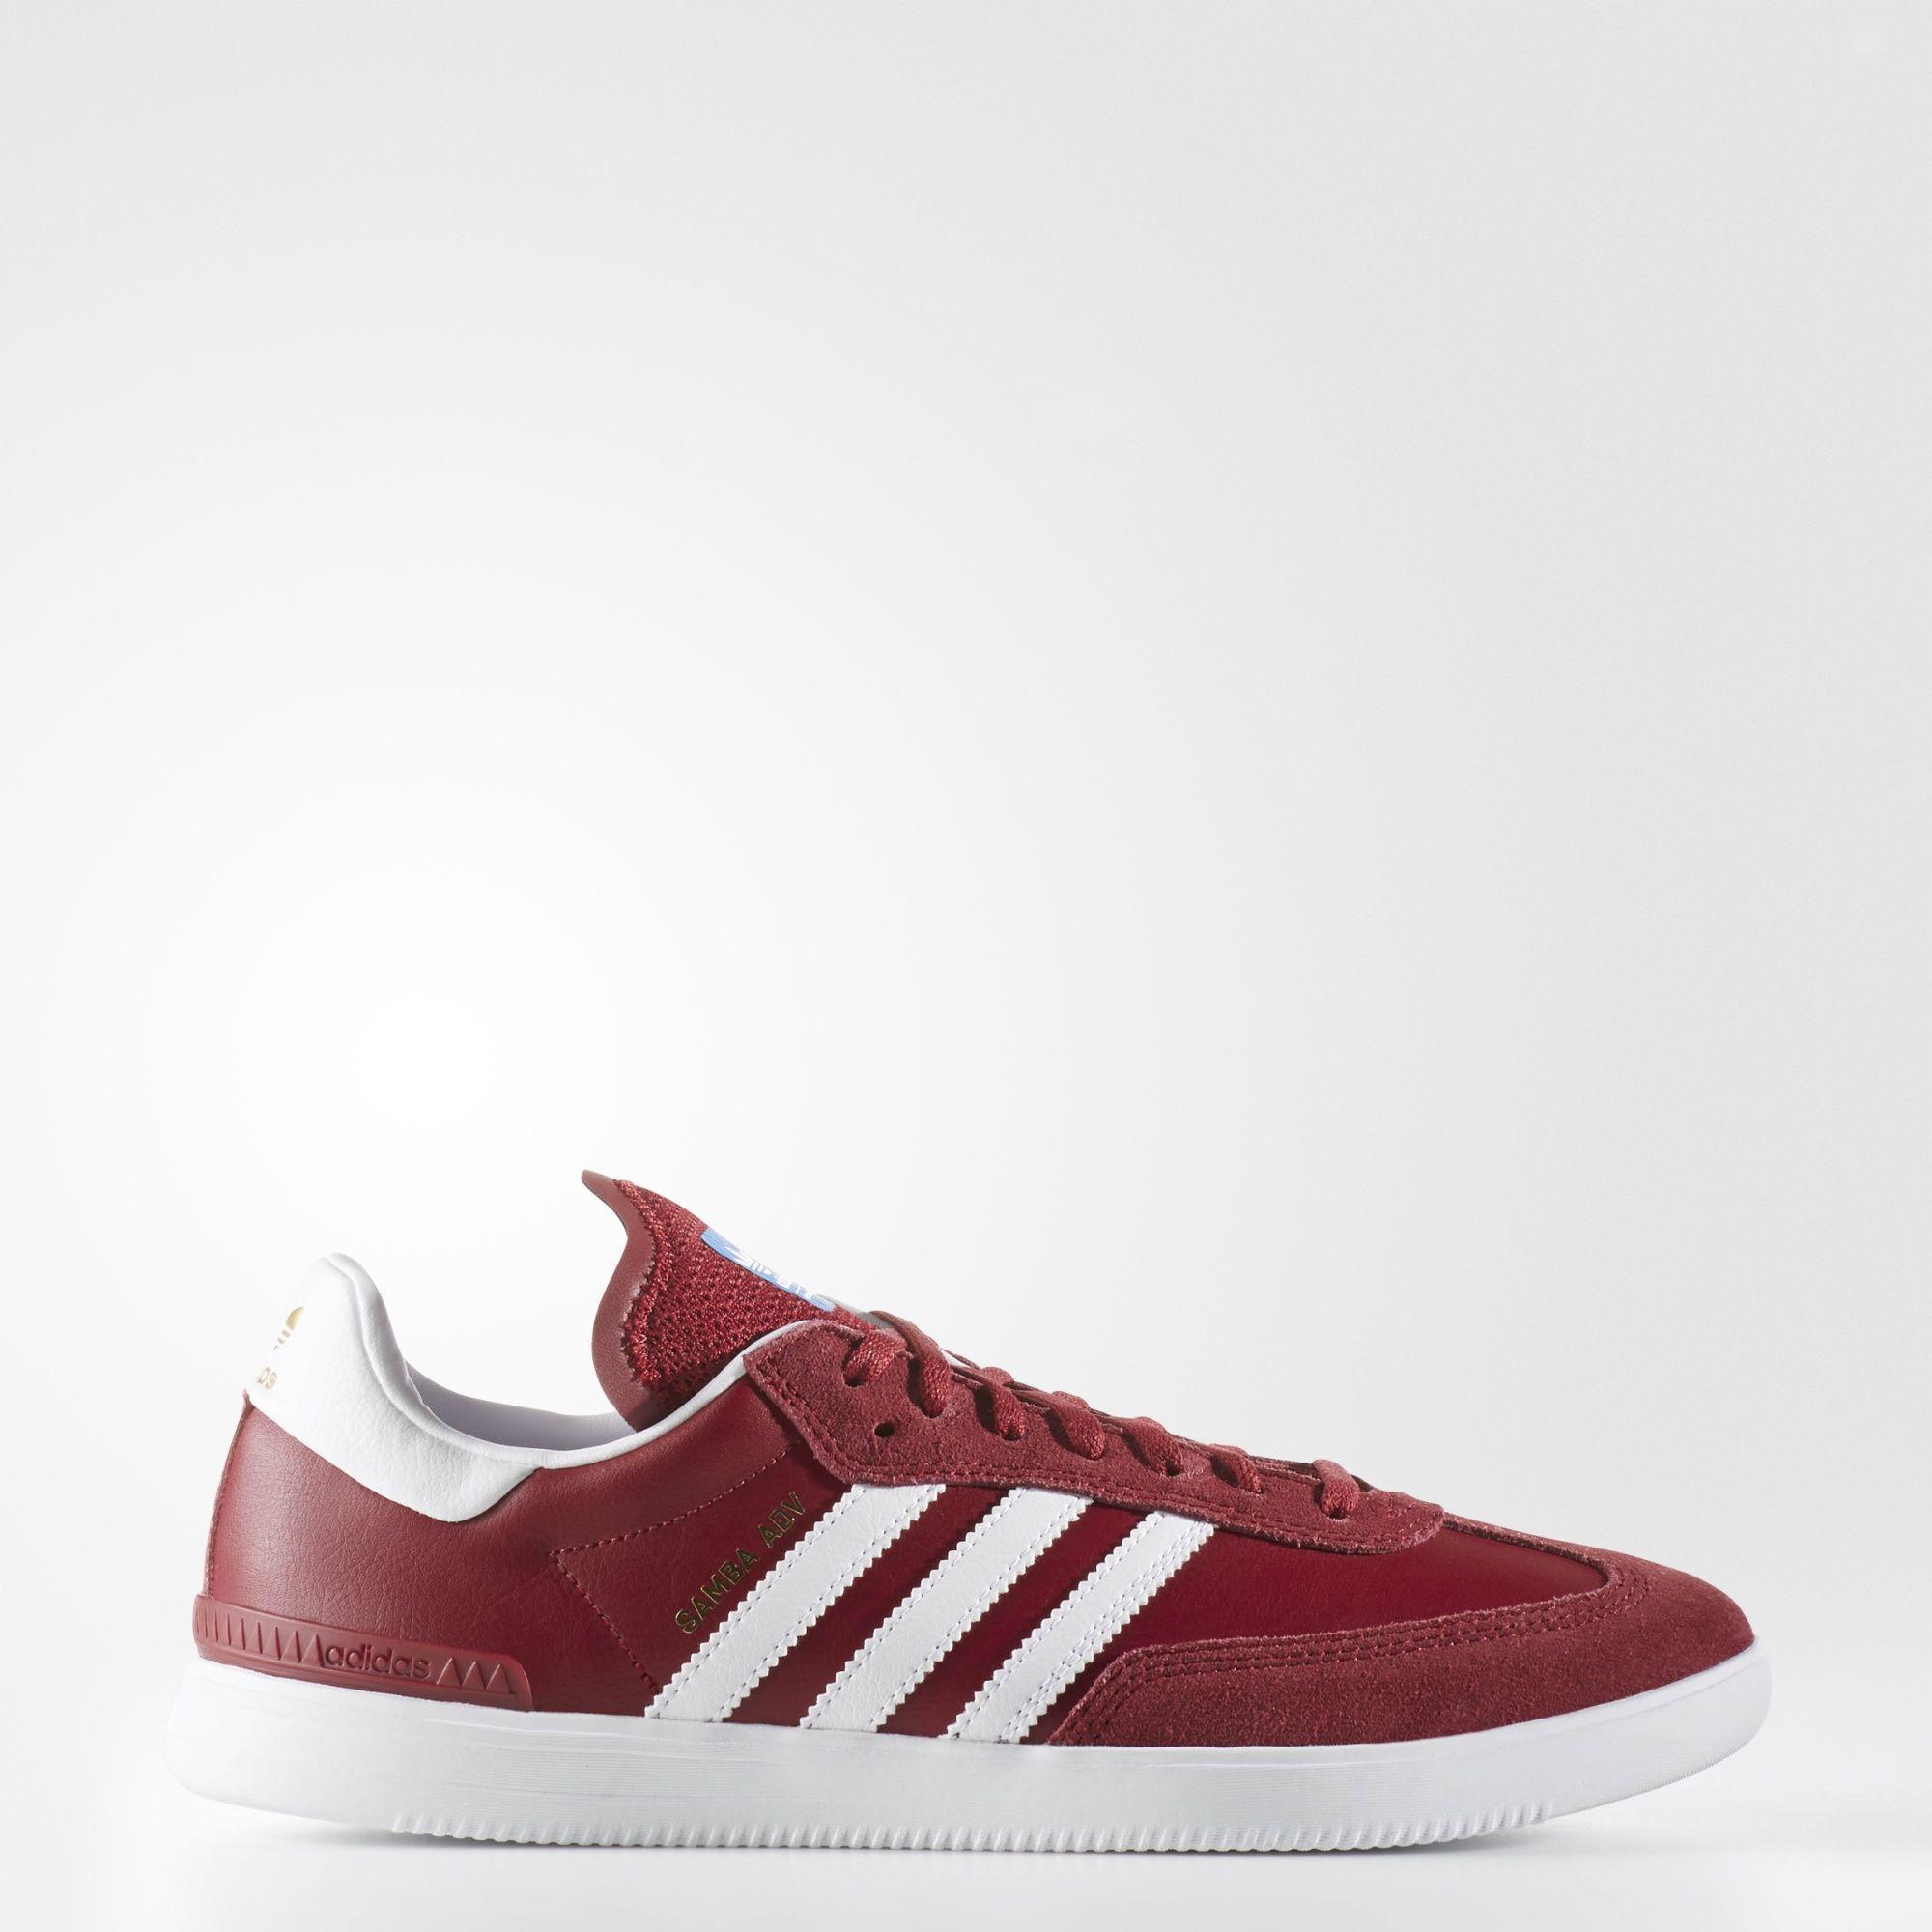 100% authentic 65d13 e8cac adidas - Samba ADV Shoes